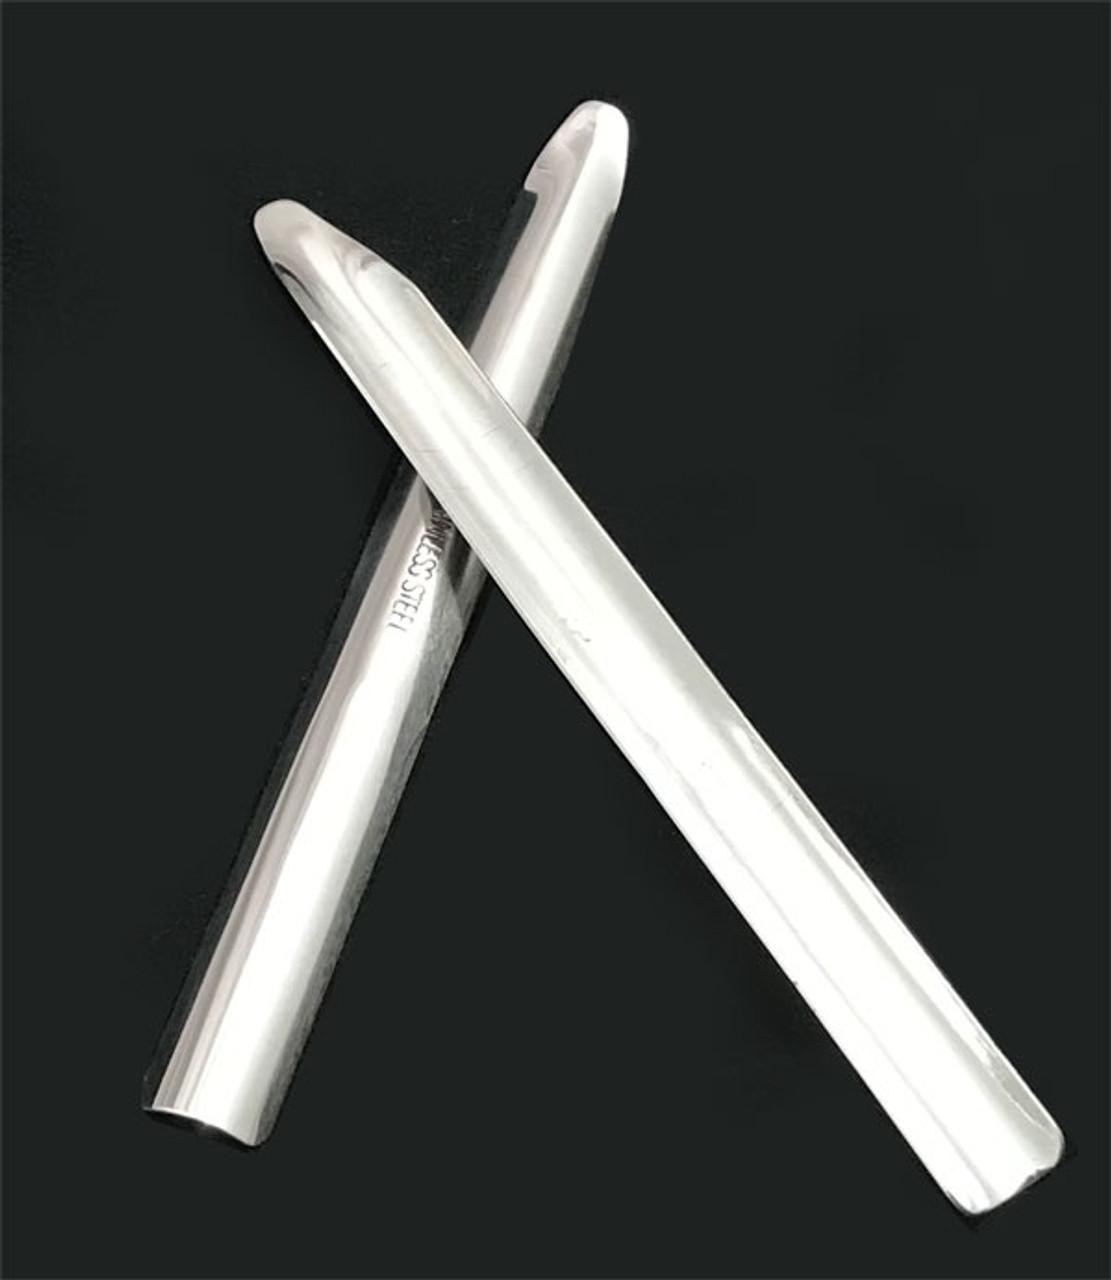 Scoop type spatula